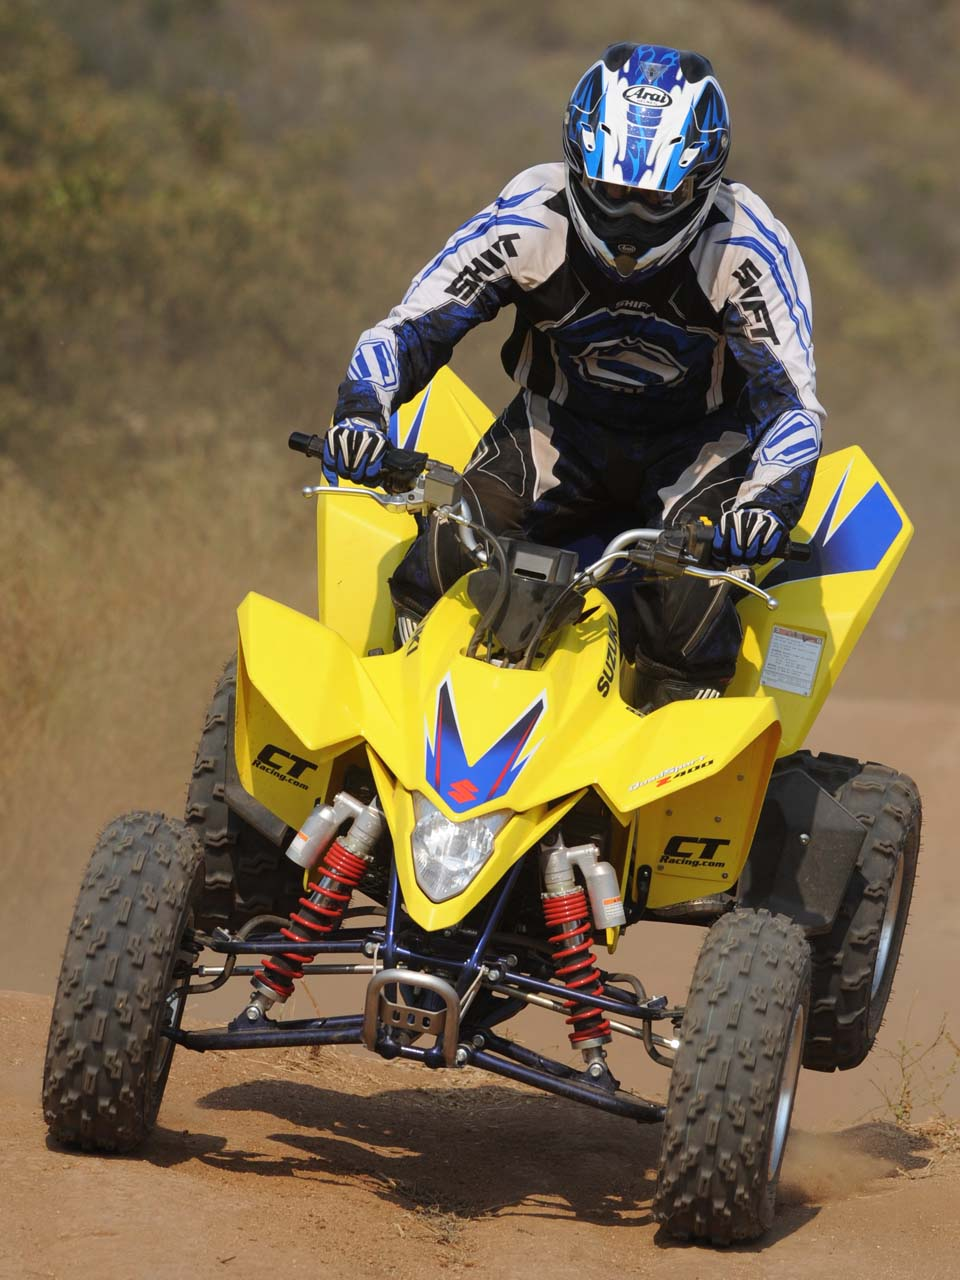 Side By Side Atv >> Best Sport ATV - The 2011 Suzuki LTZ 400 | ATV Illustrated